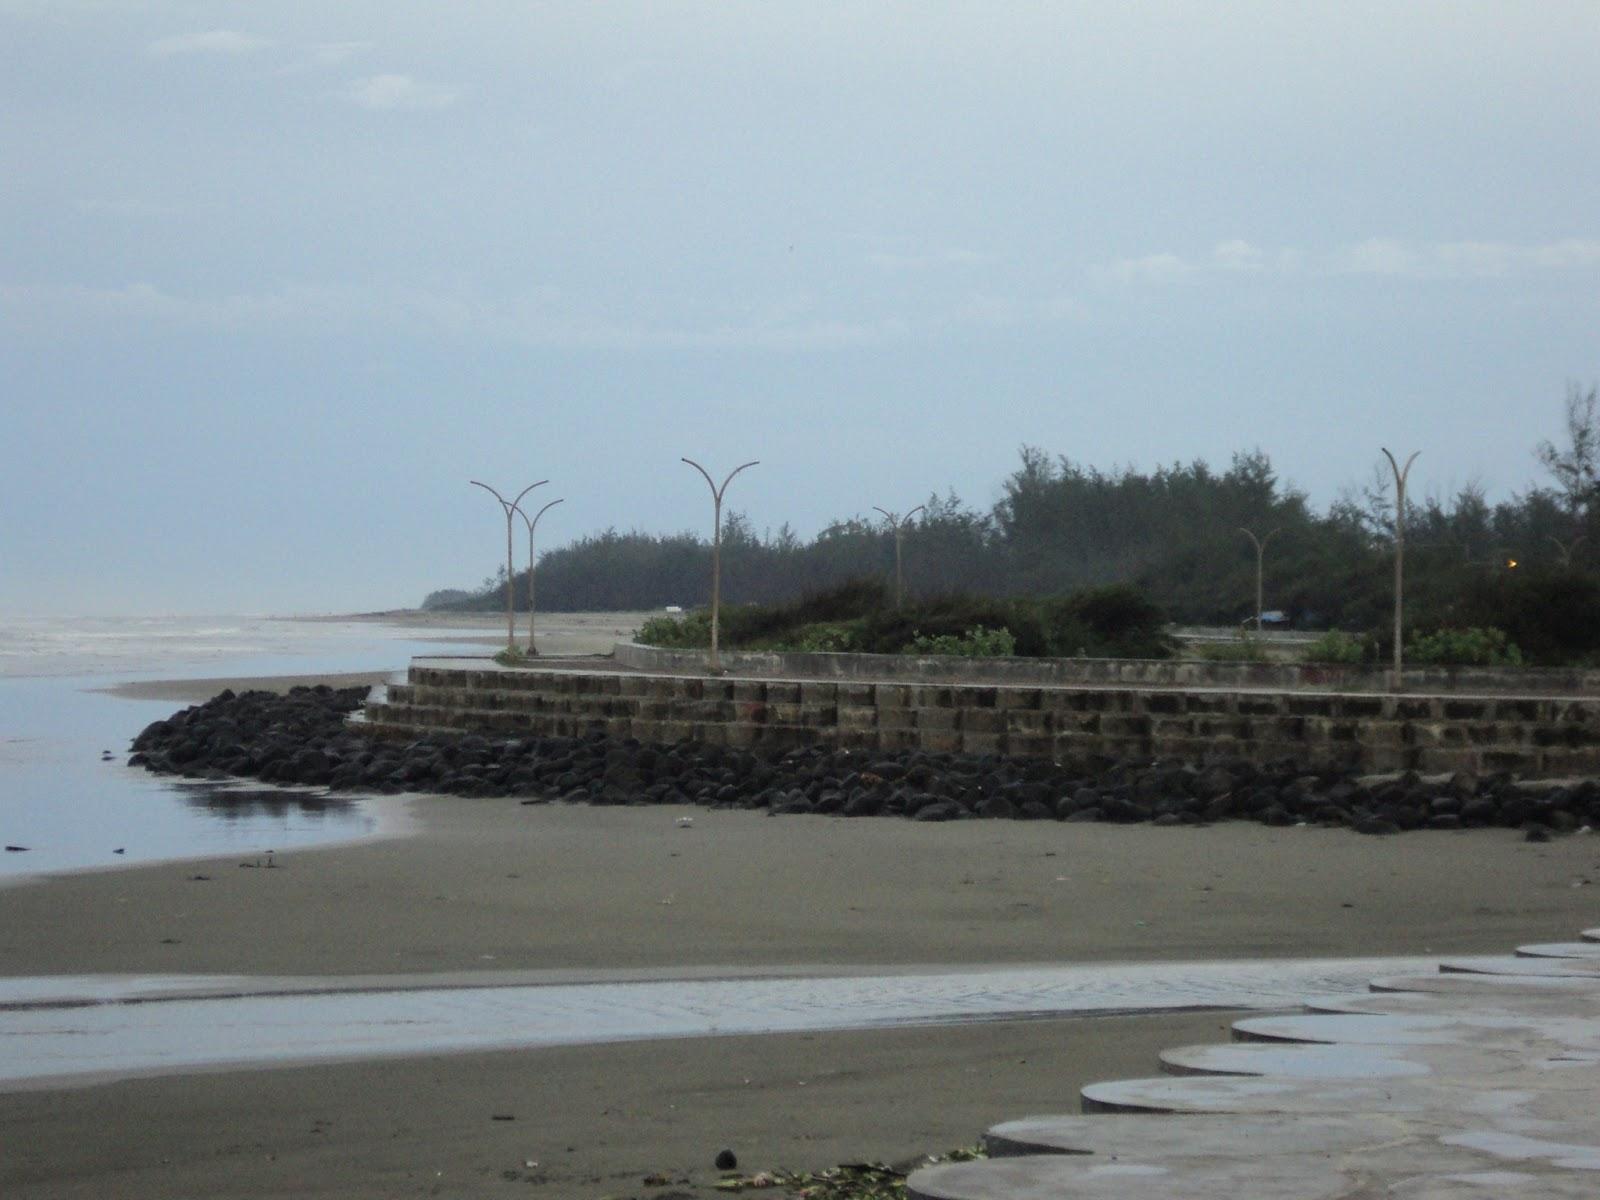 Jelajah Loka Pantai Panjang Bengkulu Tempat Sukarno Menemukan Cinta Sejati